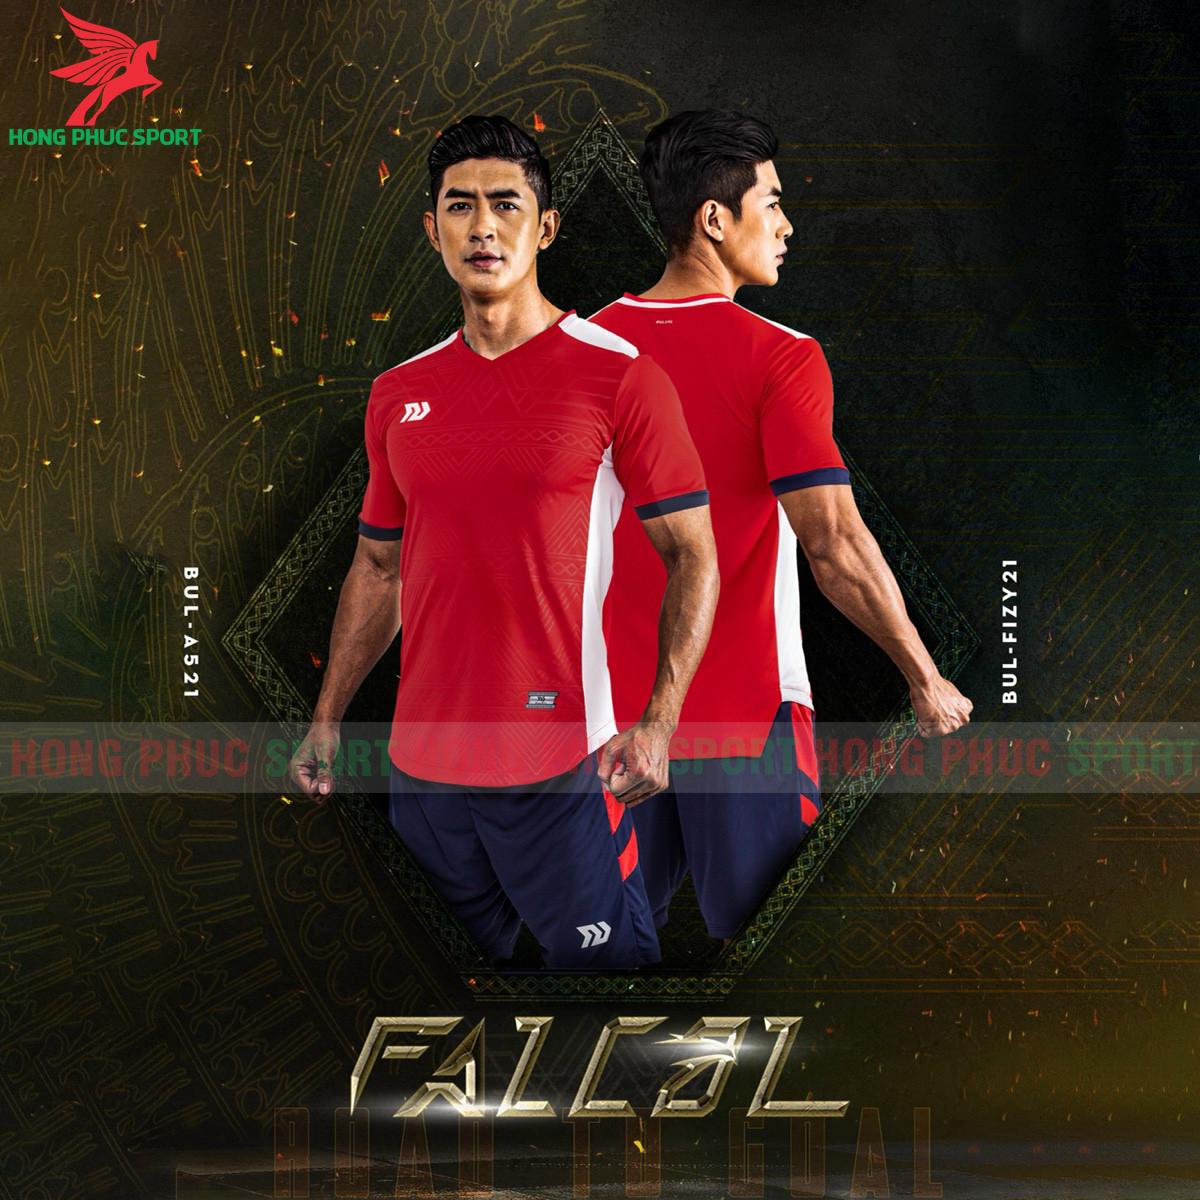 https://cdn.hongphucsport.com/unsafe/s4.shopbay.vn/files/285/ao-khong-logo-bulbal-falcol-2021-mau-do-2-6076b369c72e0.png